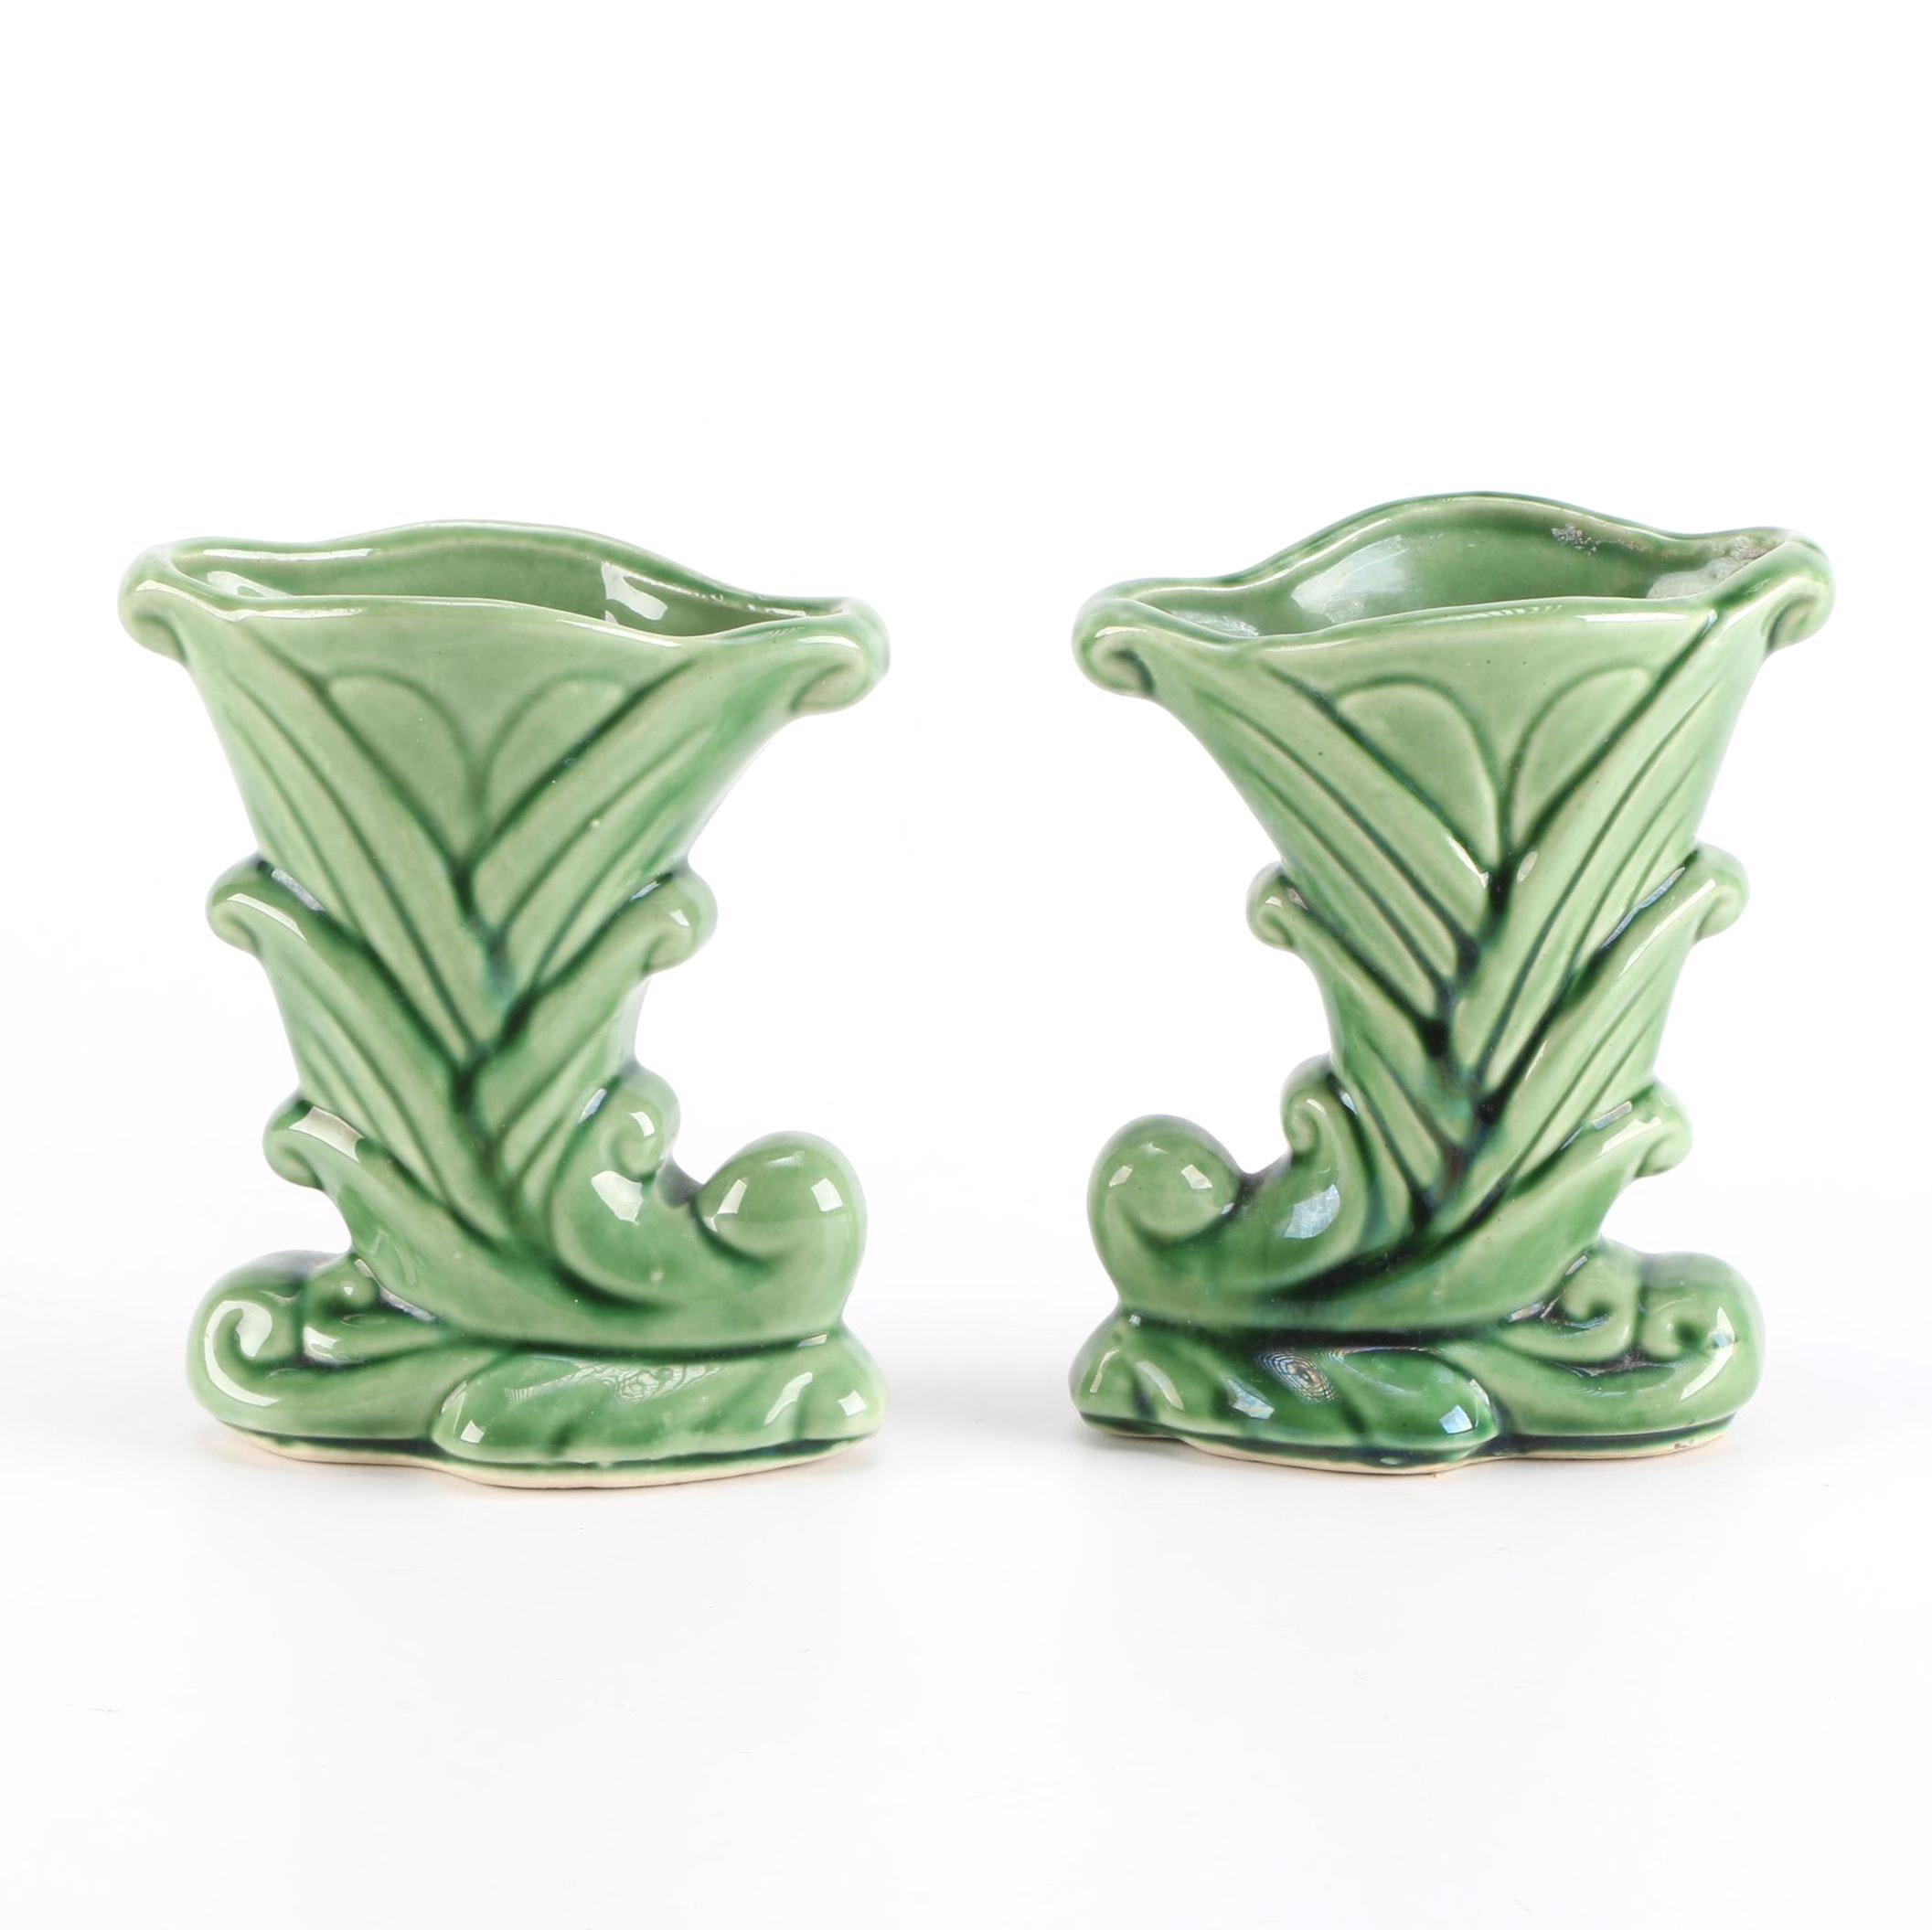 Pair of Green Glazed Pottery Vases